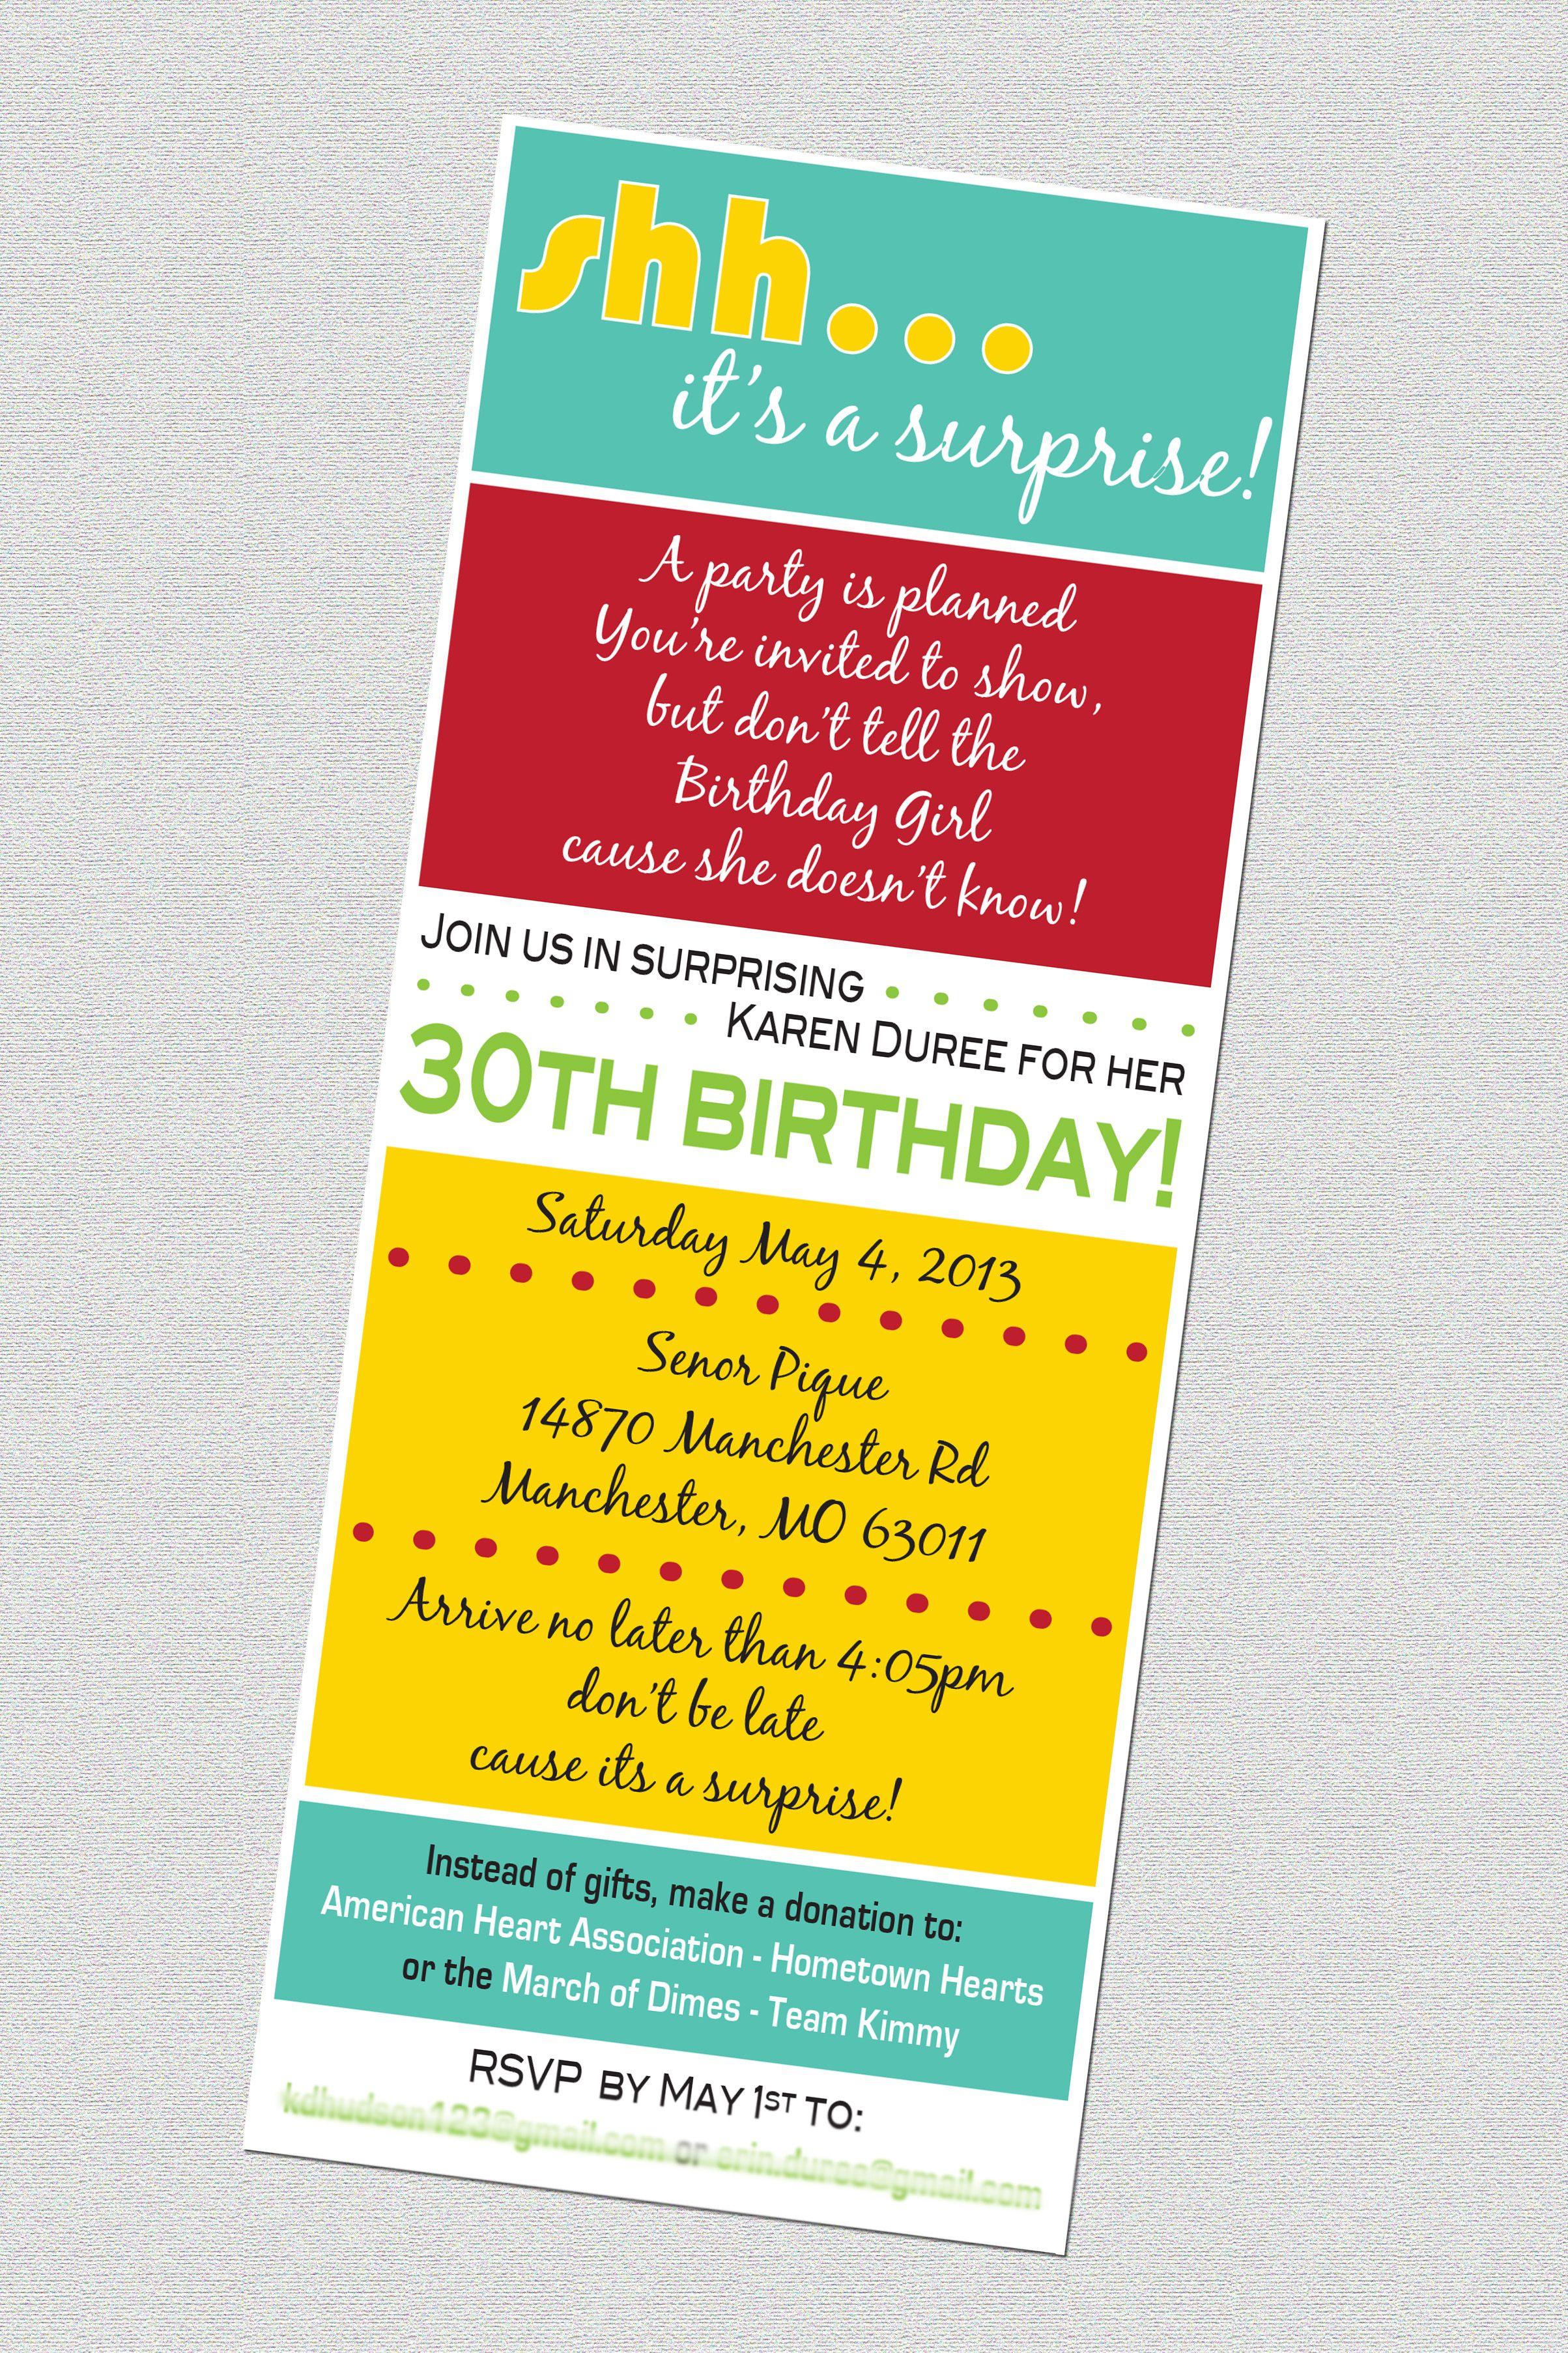 30th birthday surprise party invitation | Jensens | Pinterest ...